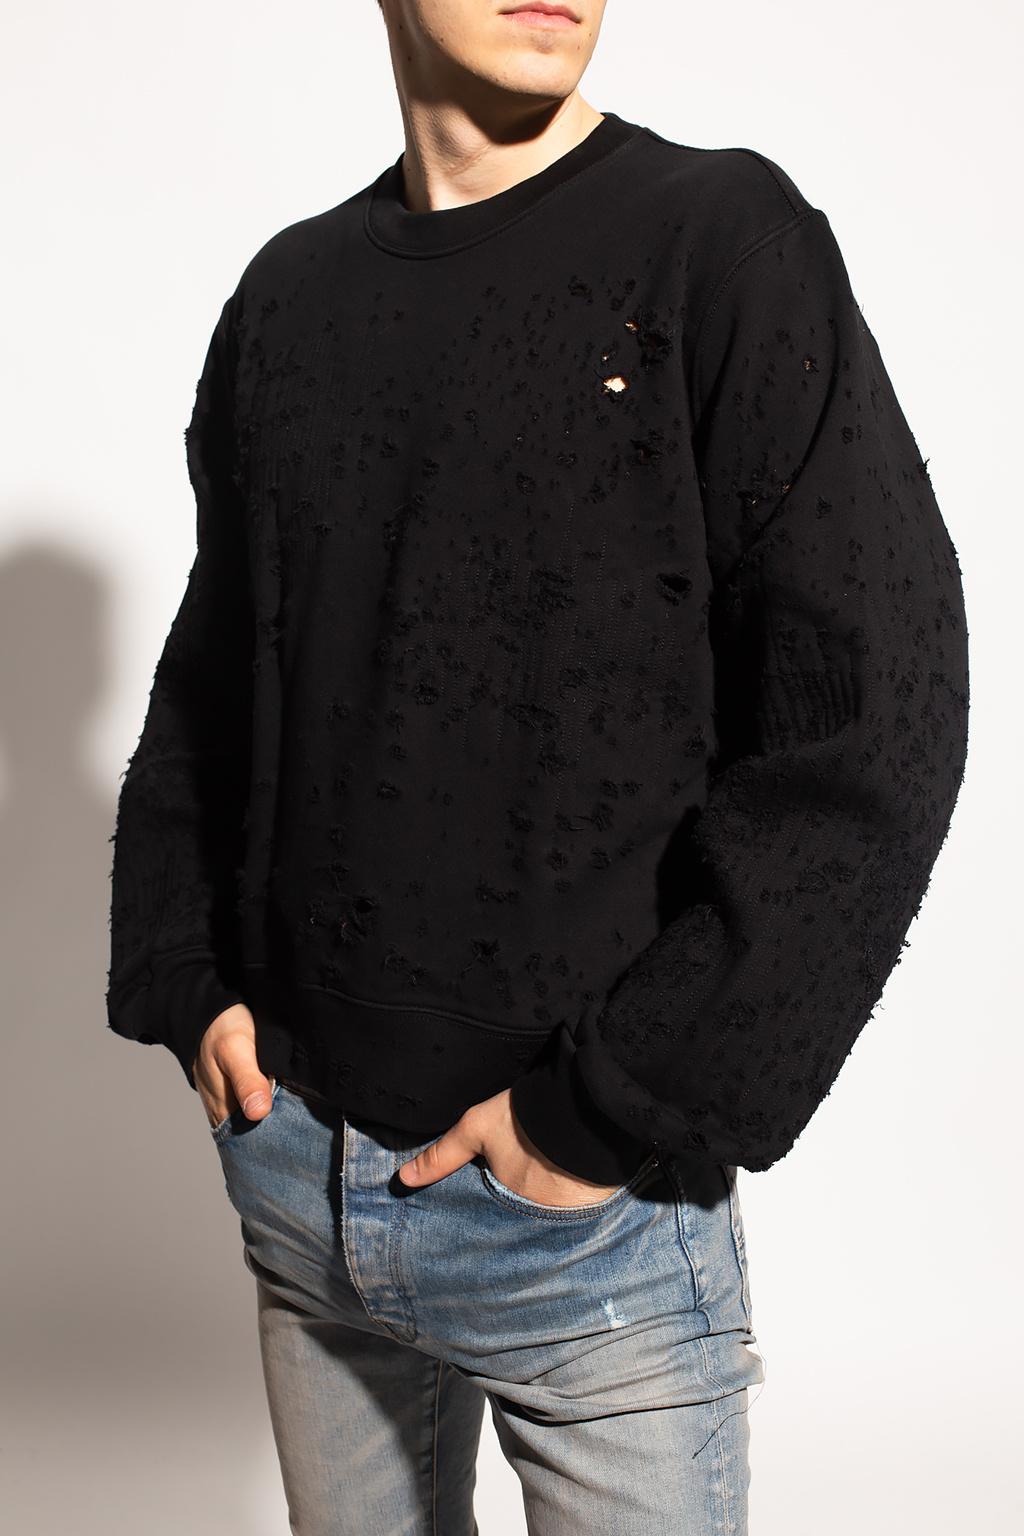 Amiri Sweatshirt with decorative holes